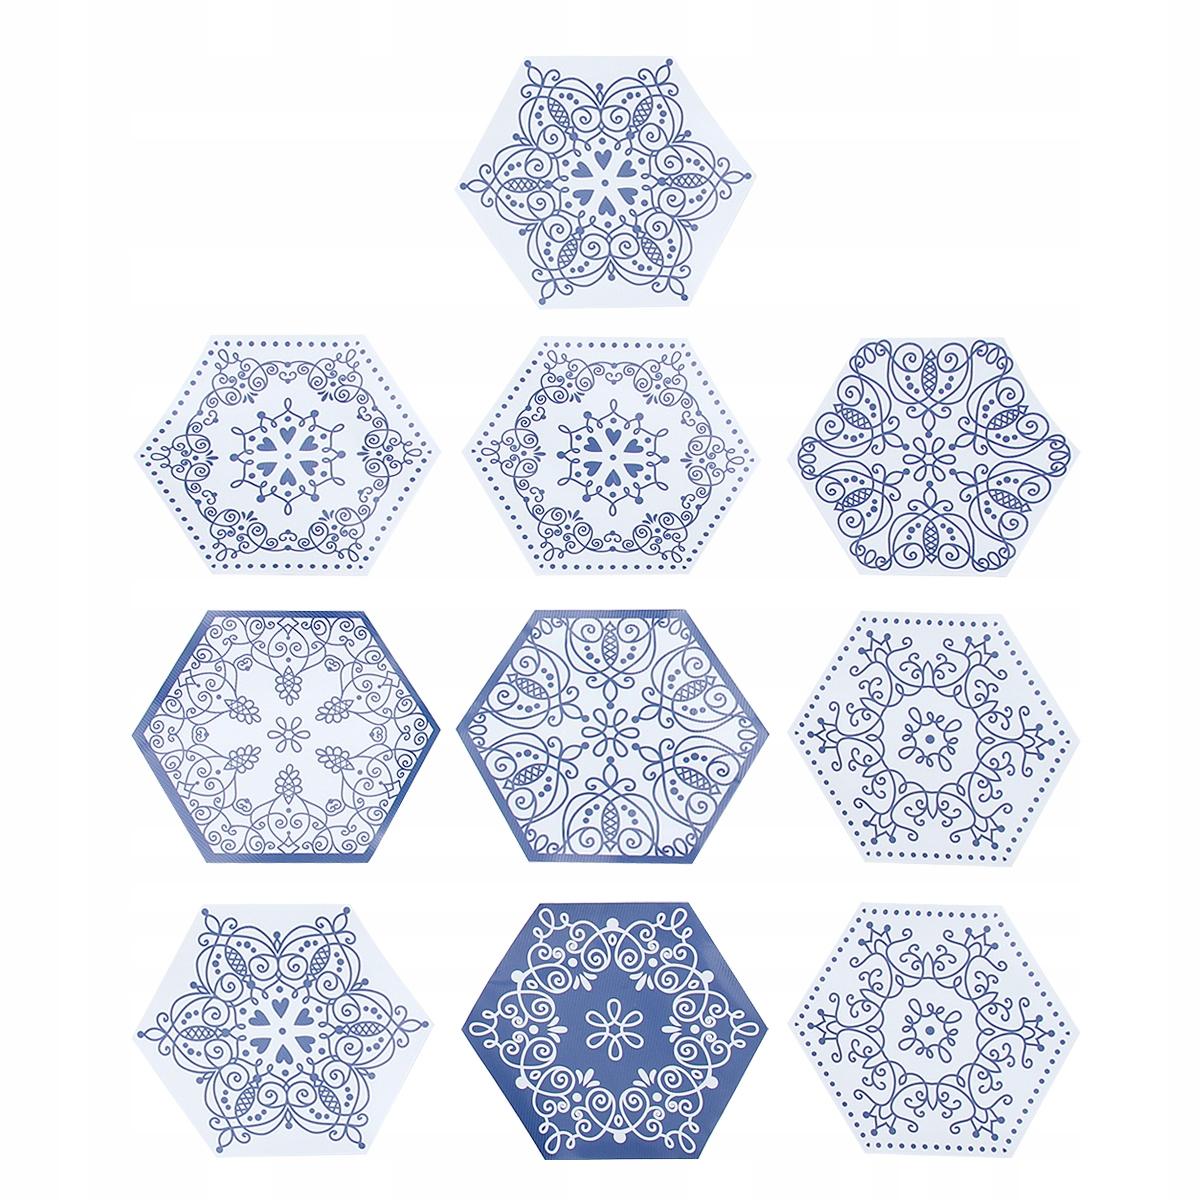 10pcs 3D Retro Hexagonal Simulation stickers